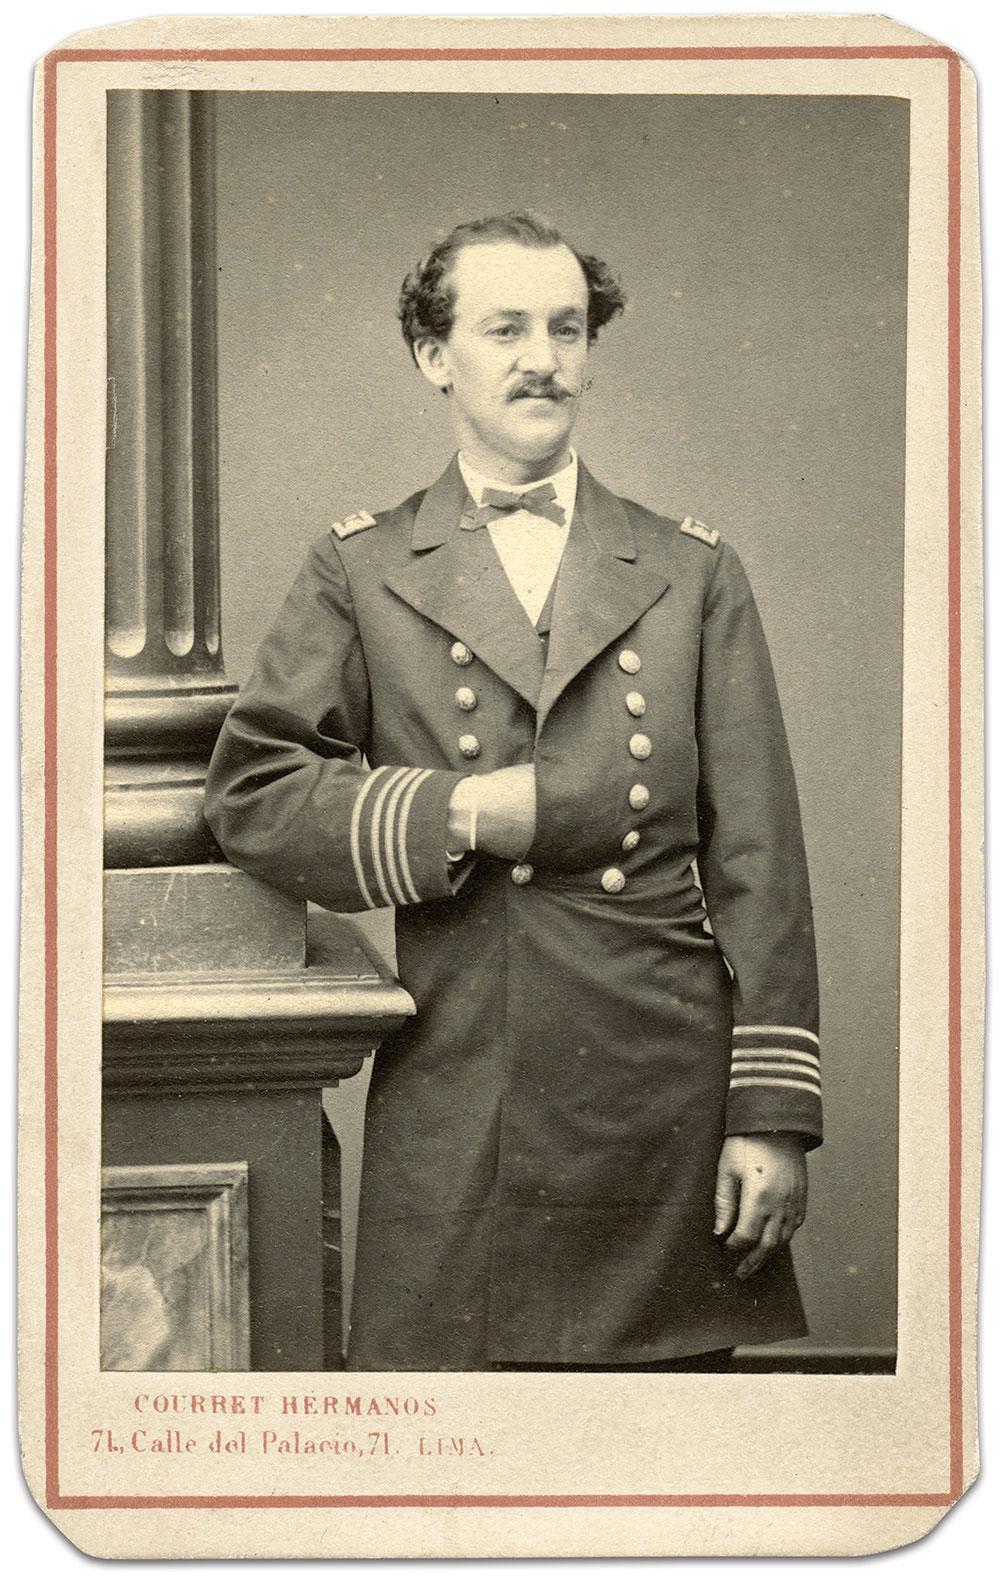 Paymaster Henry Meigs Meade, U.S. Navy. Carte de visite by Courret Hermanos of Lima, Peru, about 1869. Ronald S. Coddington Collection.